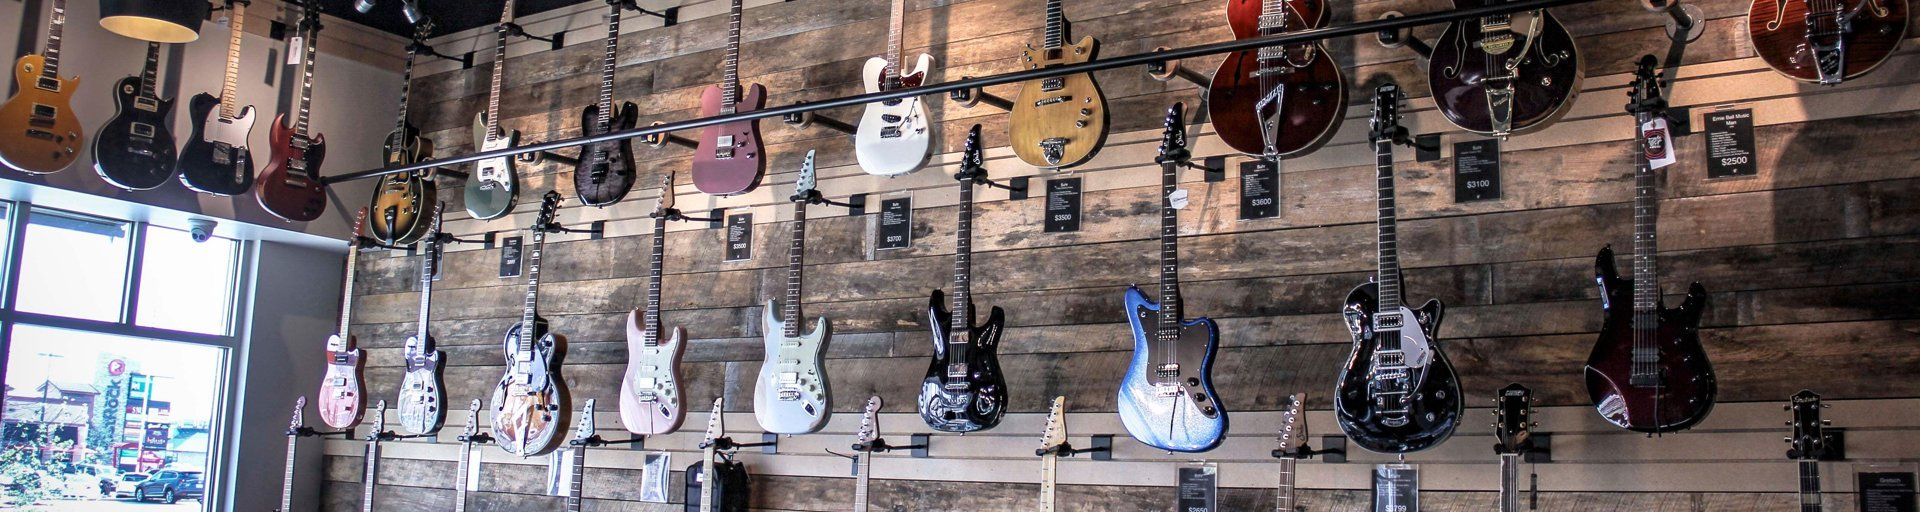 the finest music gear in oklahoma barnett music store